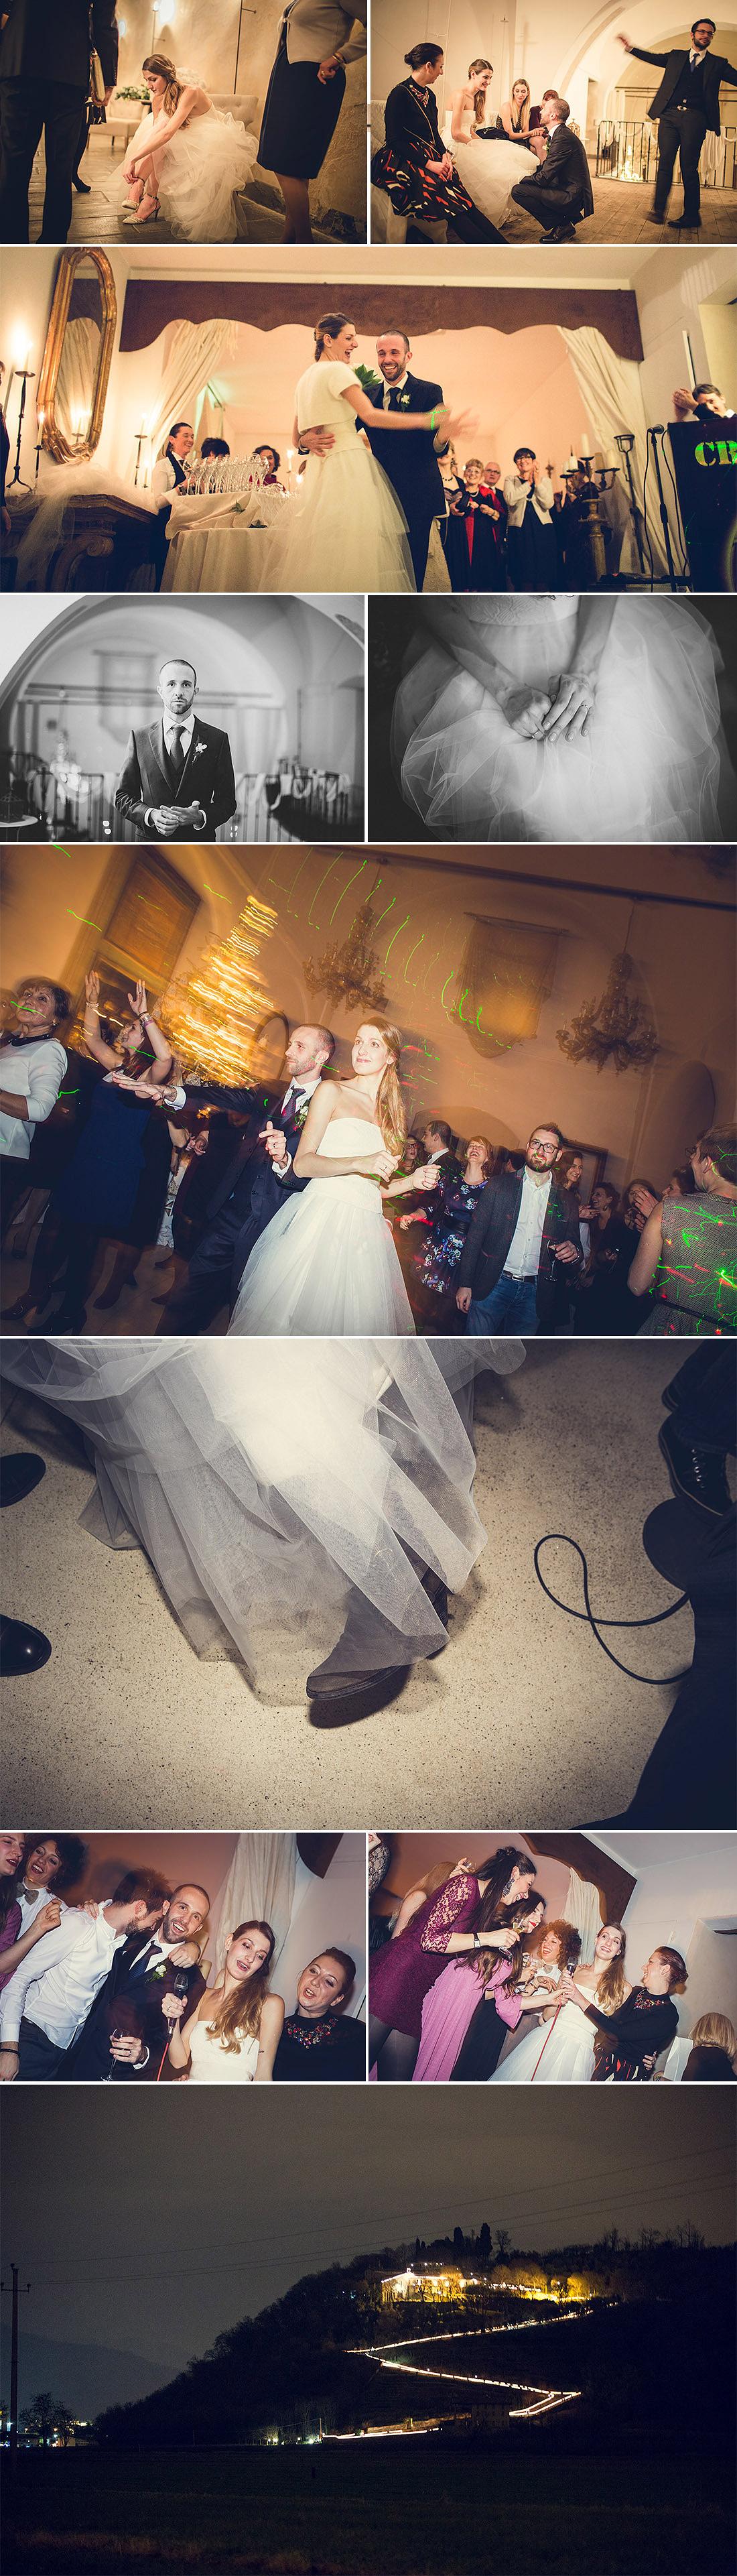 gusmeri_fotografo_matrimonio_sara_massimo3